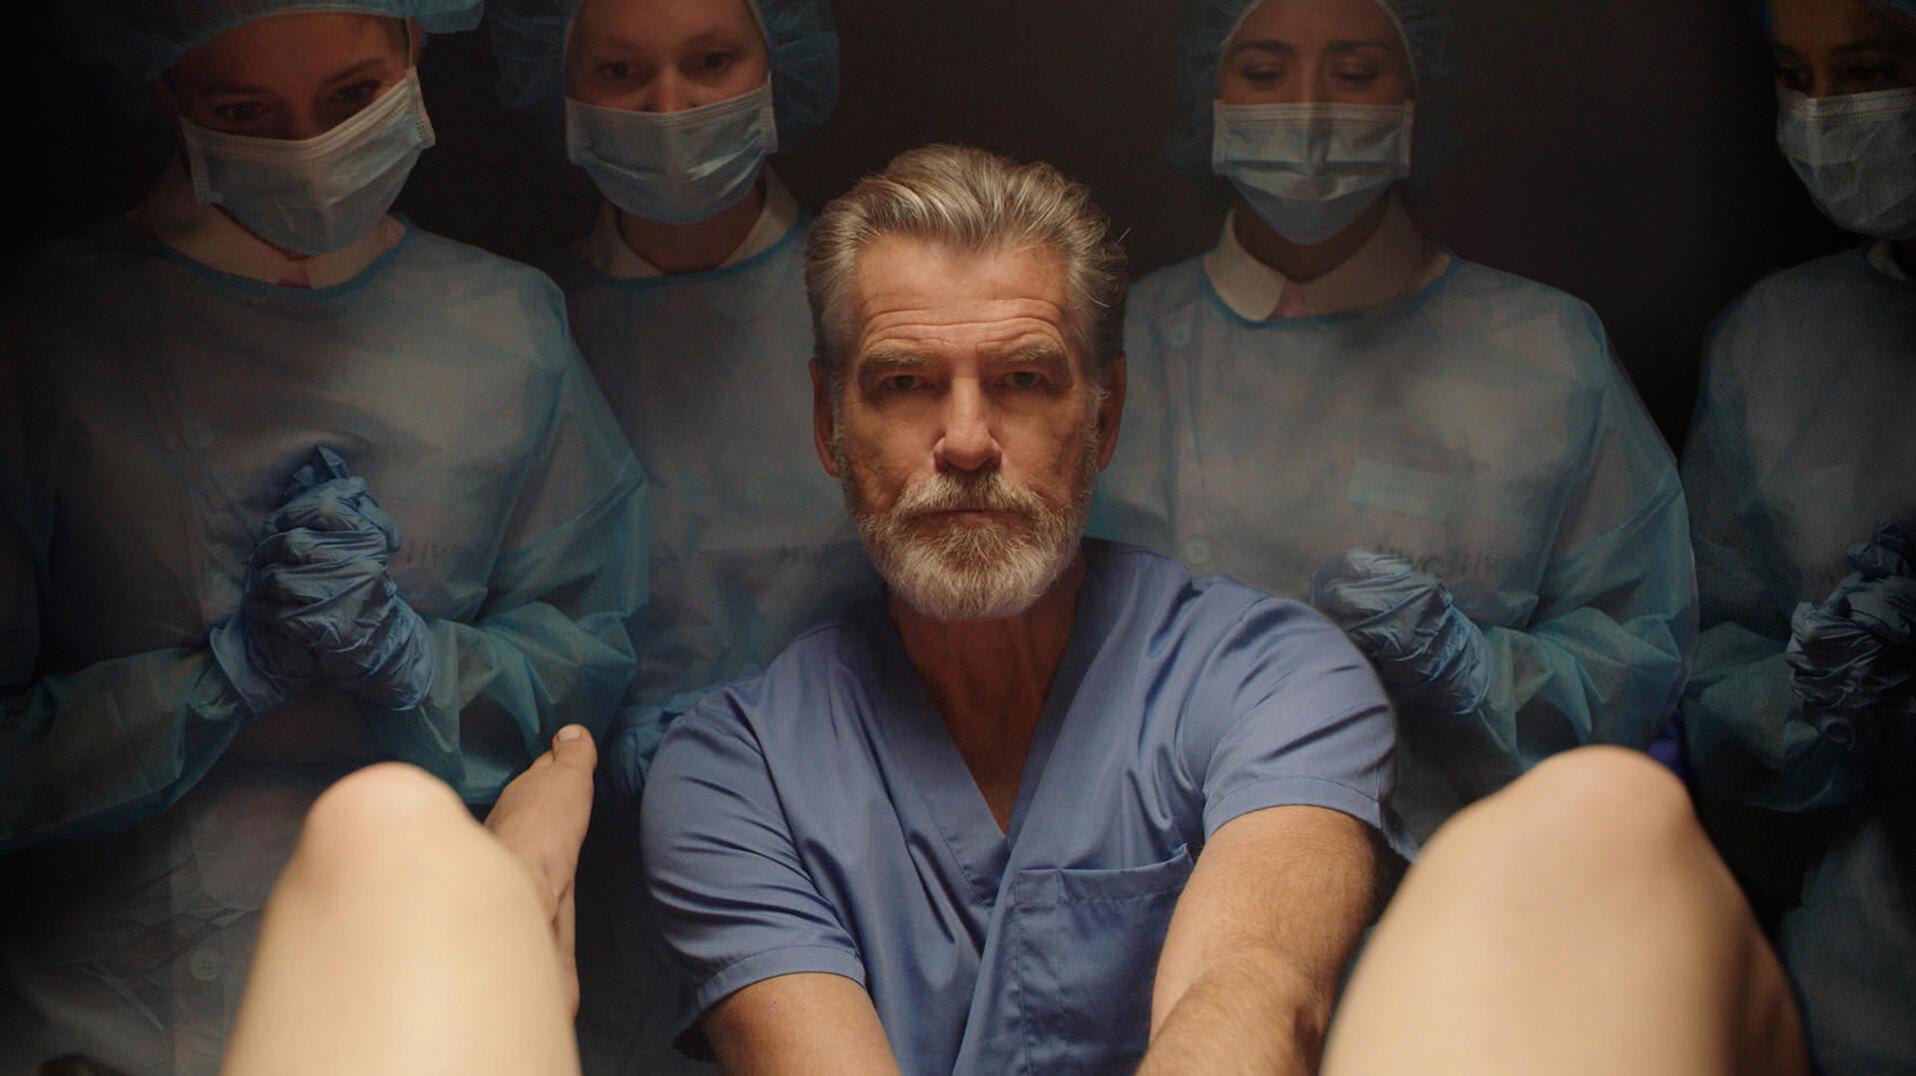 Pierce Brosnan as Doctor Hindle in Hulu's False Positive